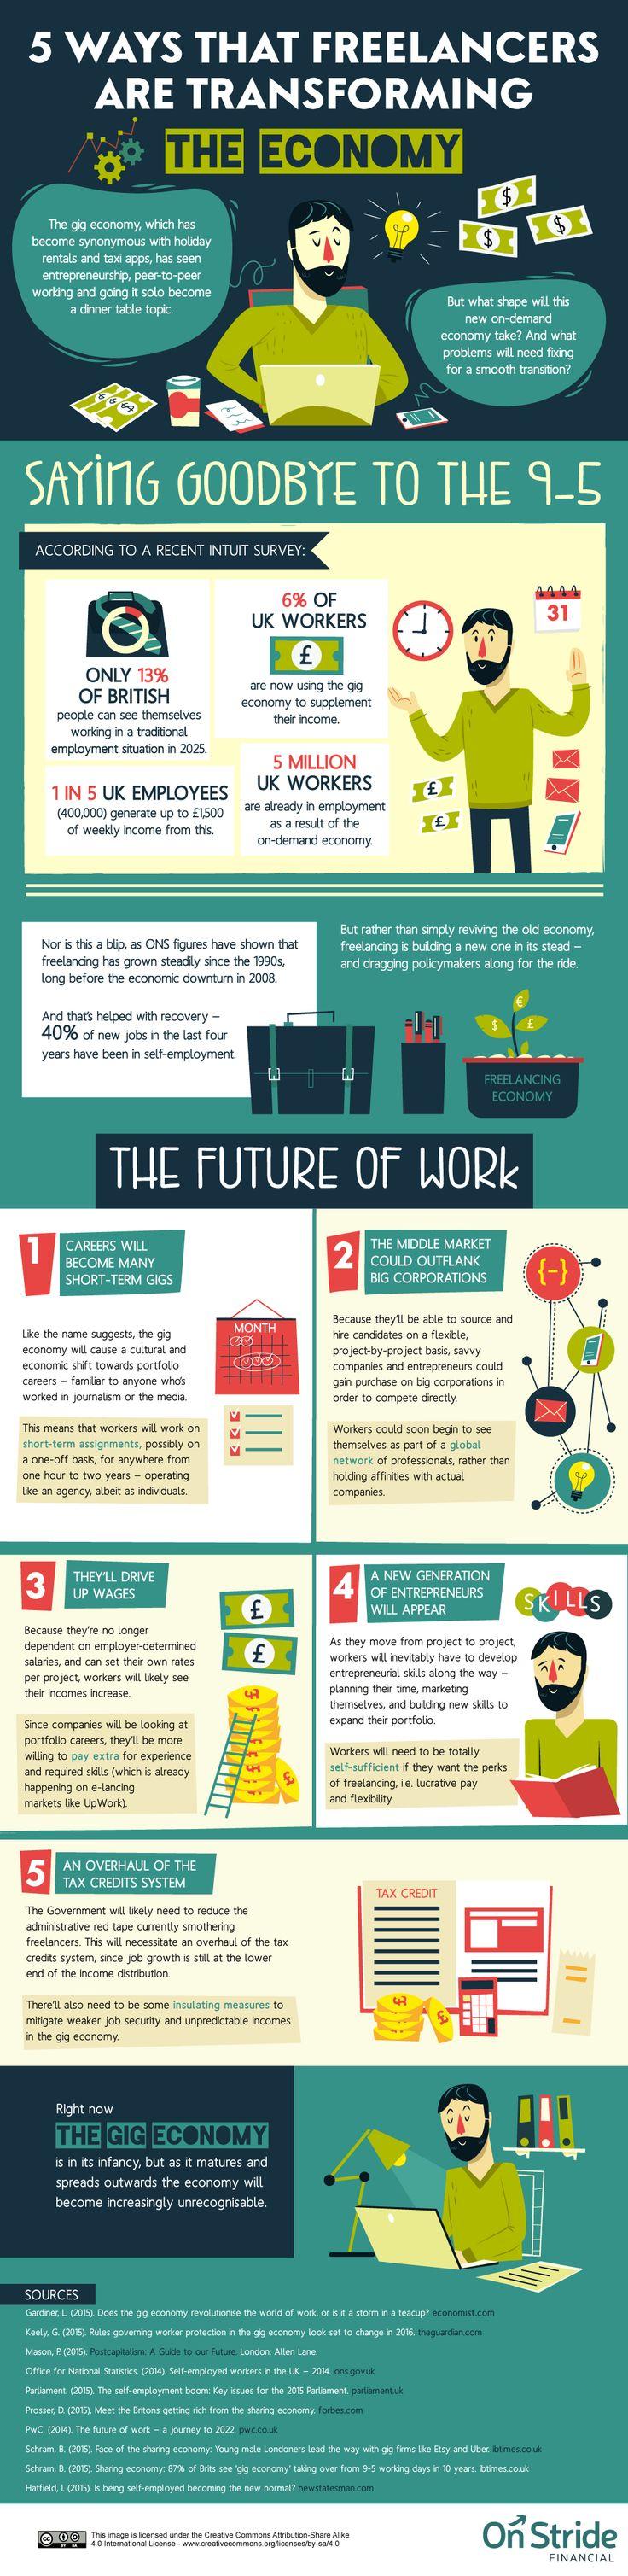 5 Ways That Freelancers are Transforming the Economy #Infographic #Economy #Freelancing